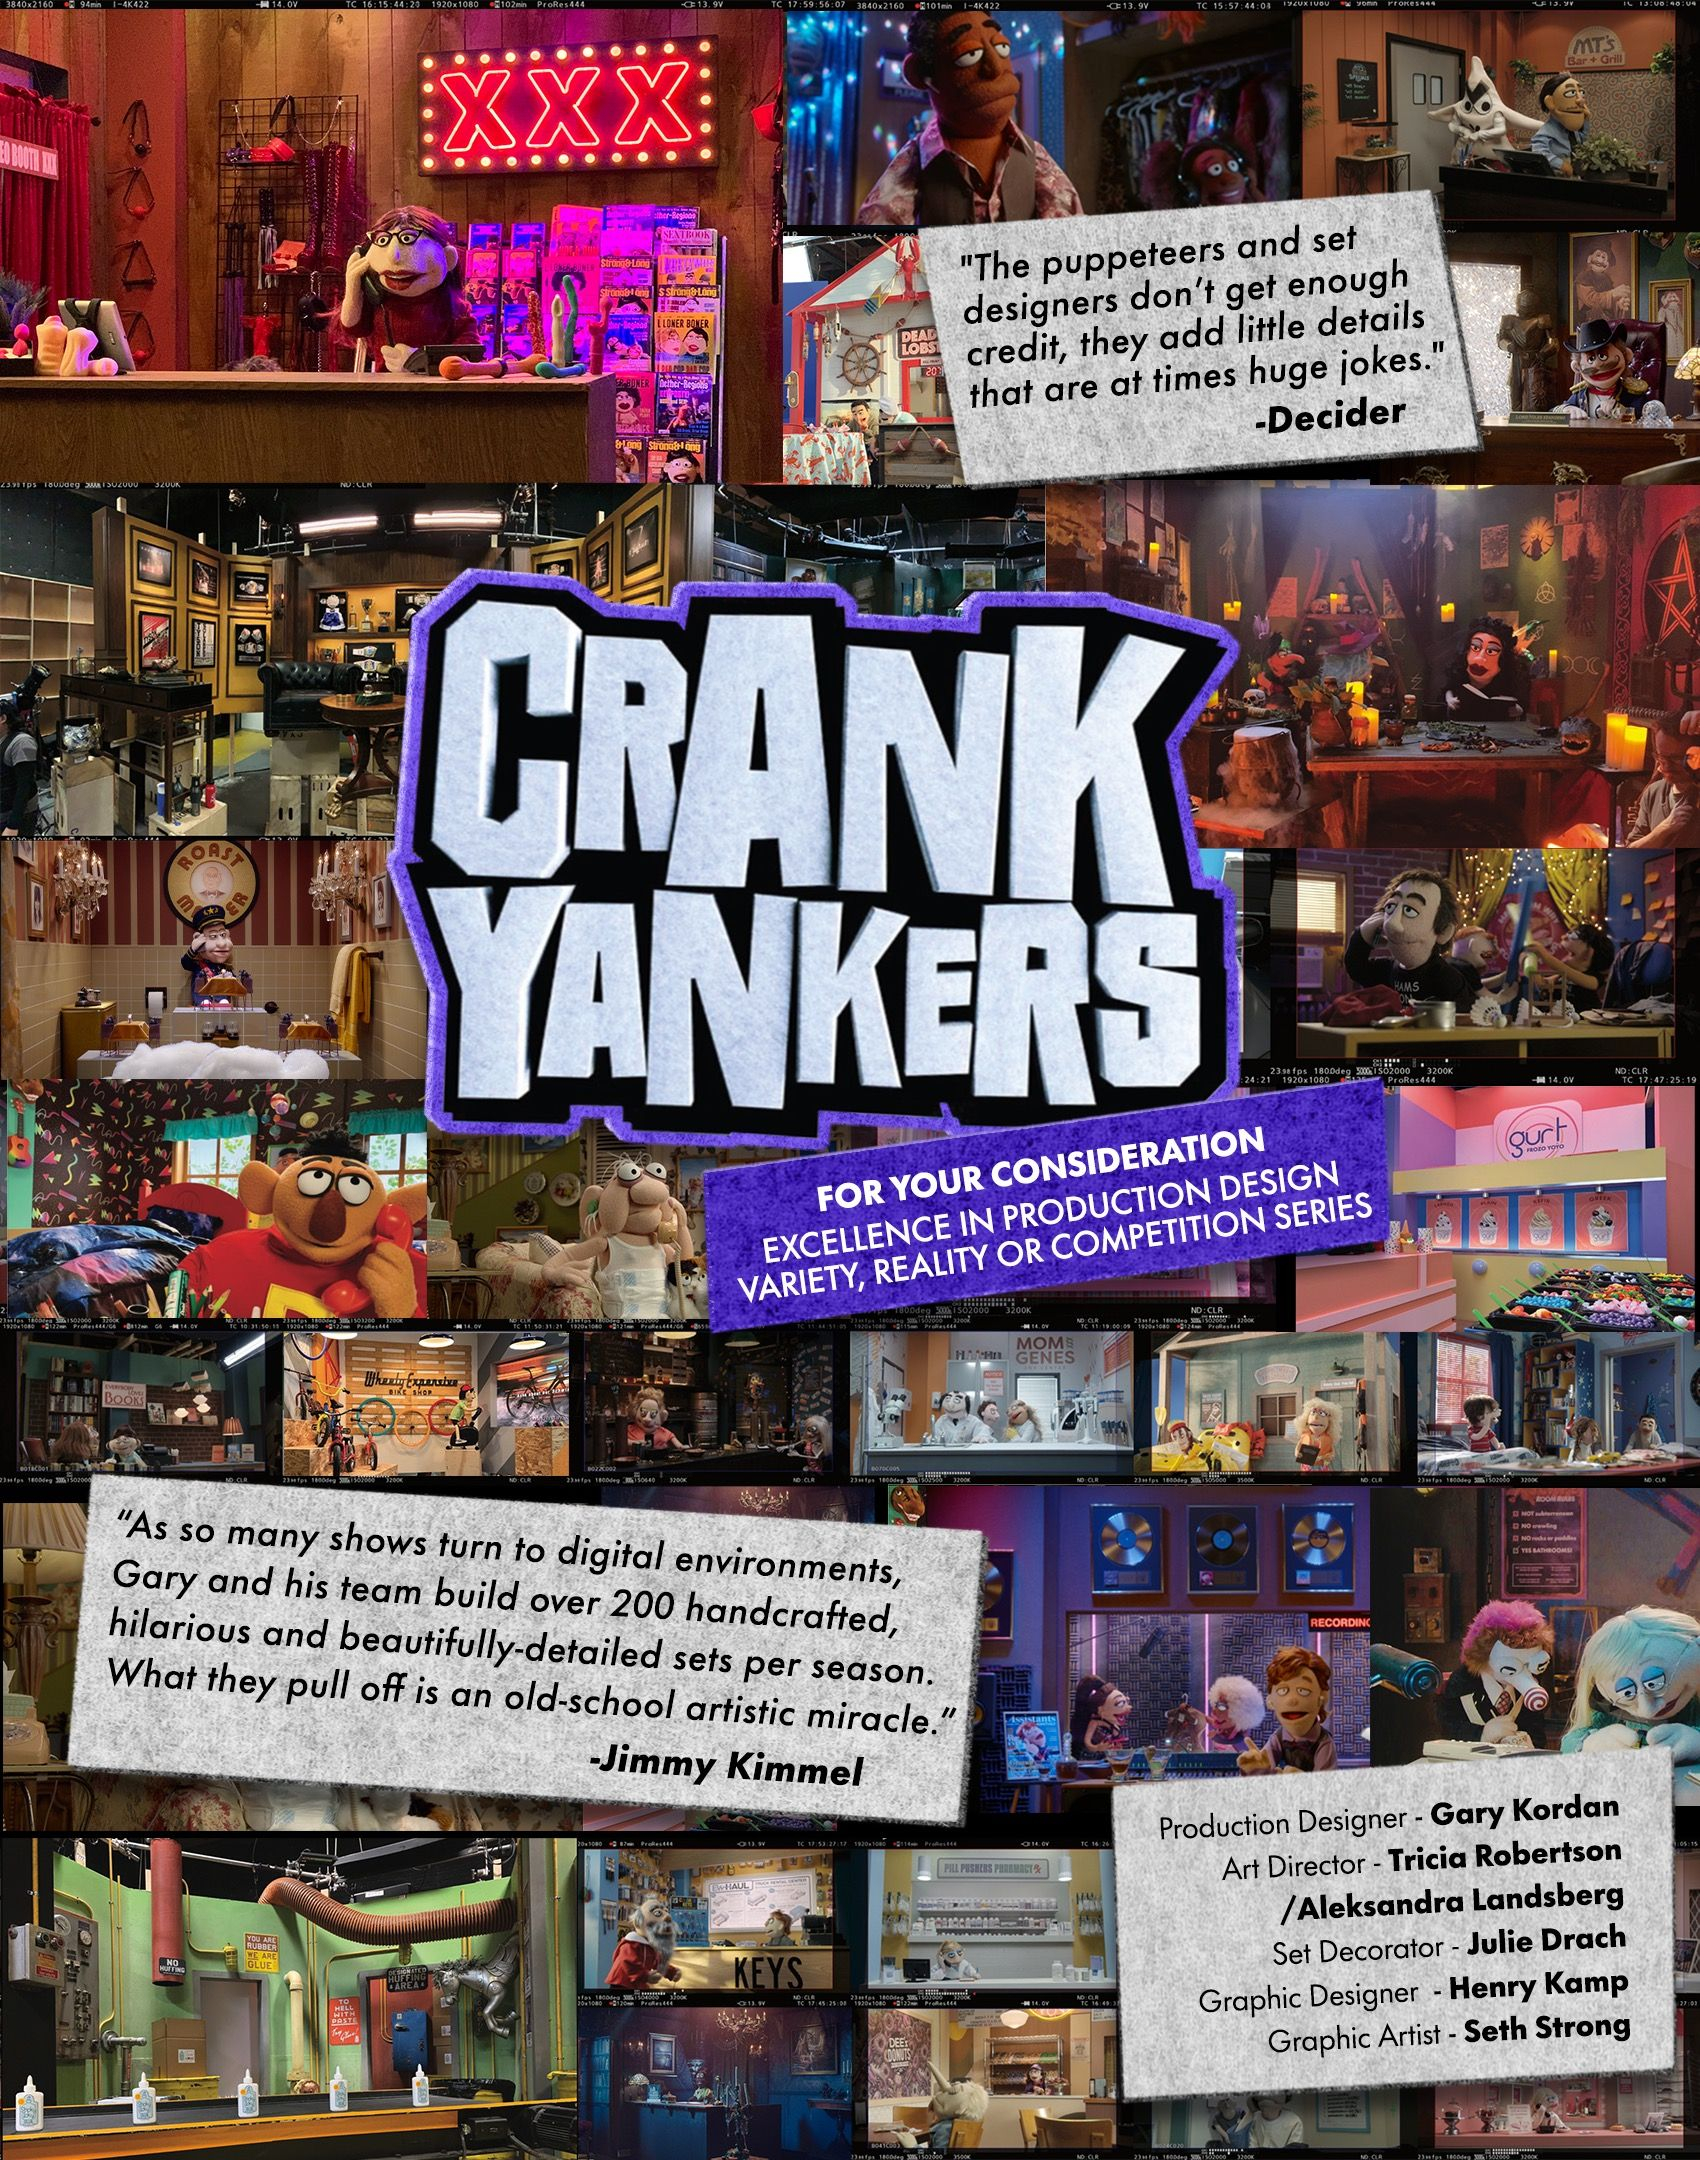 Crank_Yankers_adg_gary_kordan_.jpeg